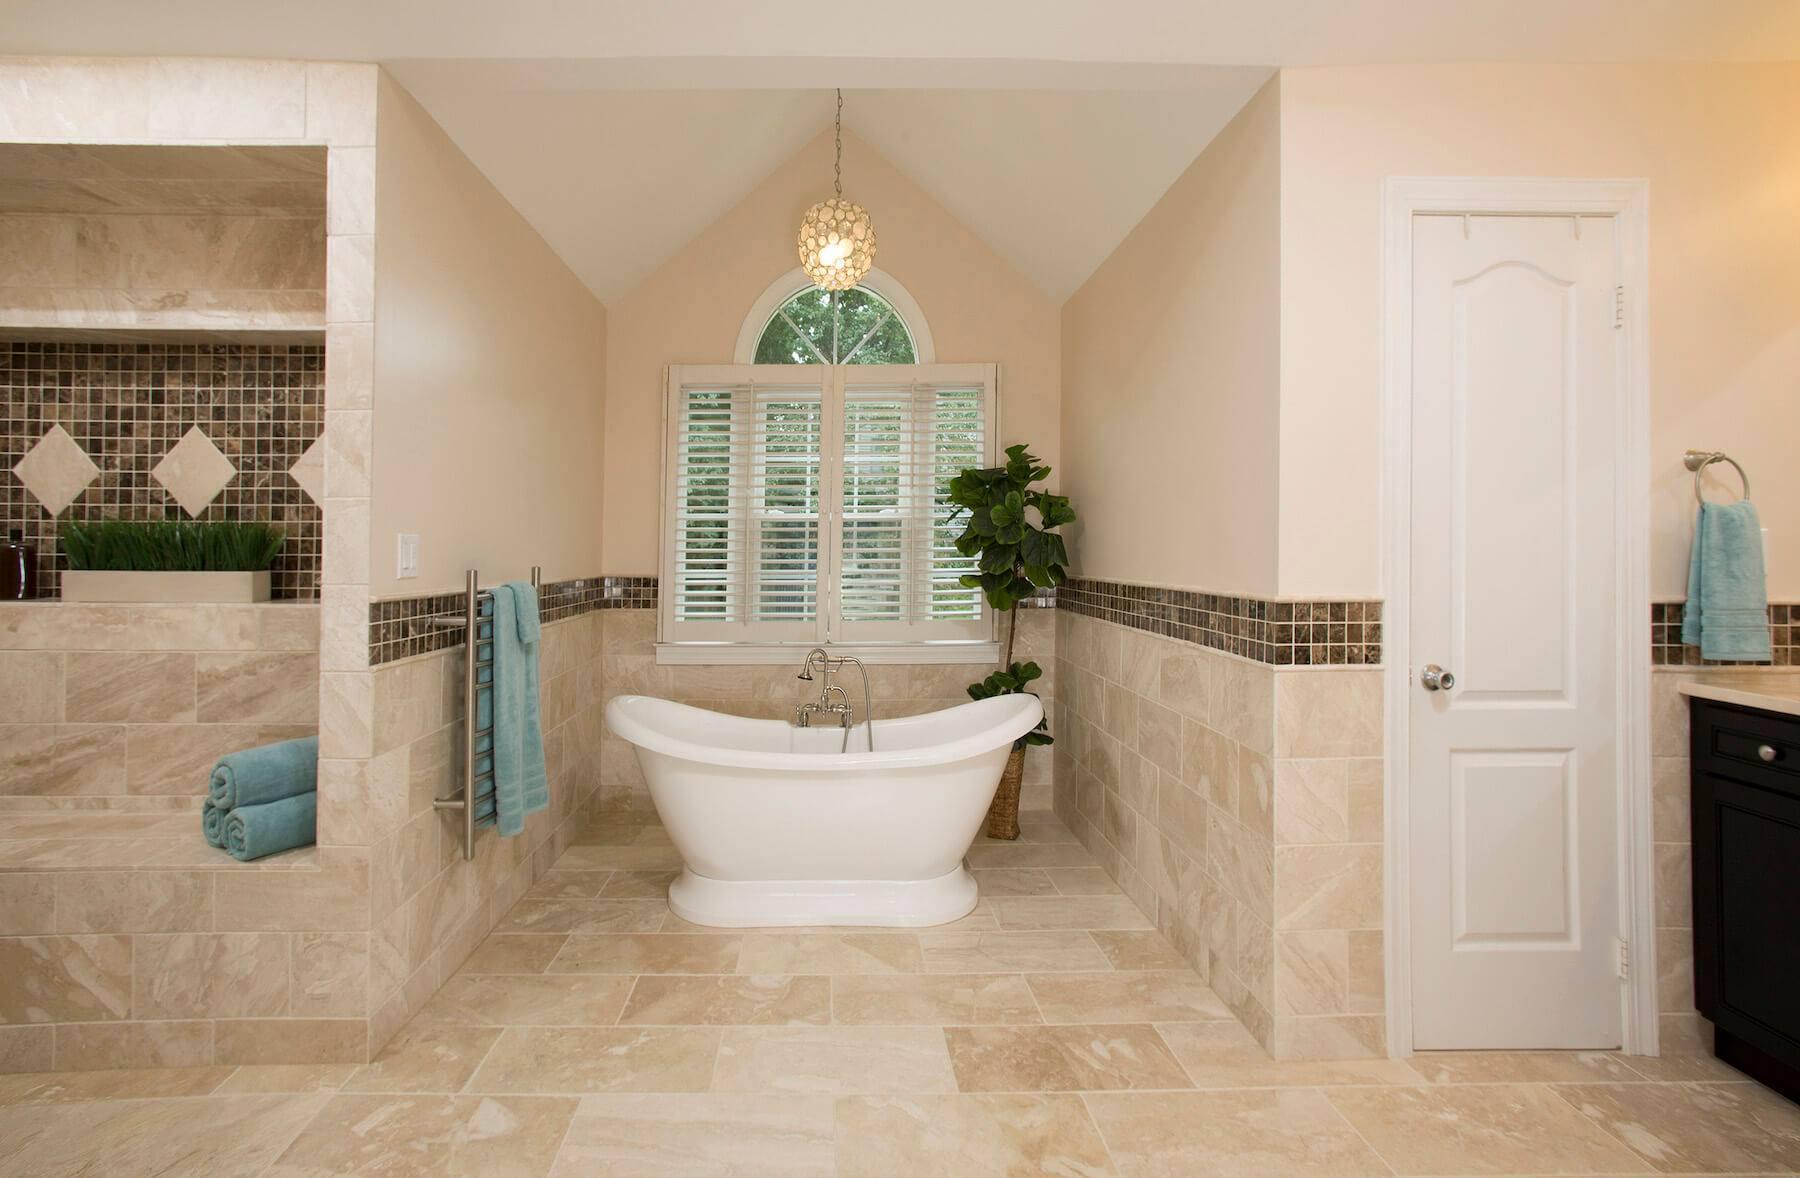 bathroomcrop_9-1-17_113